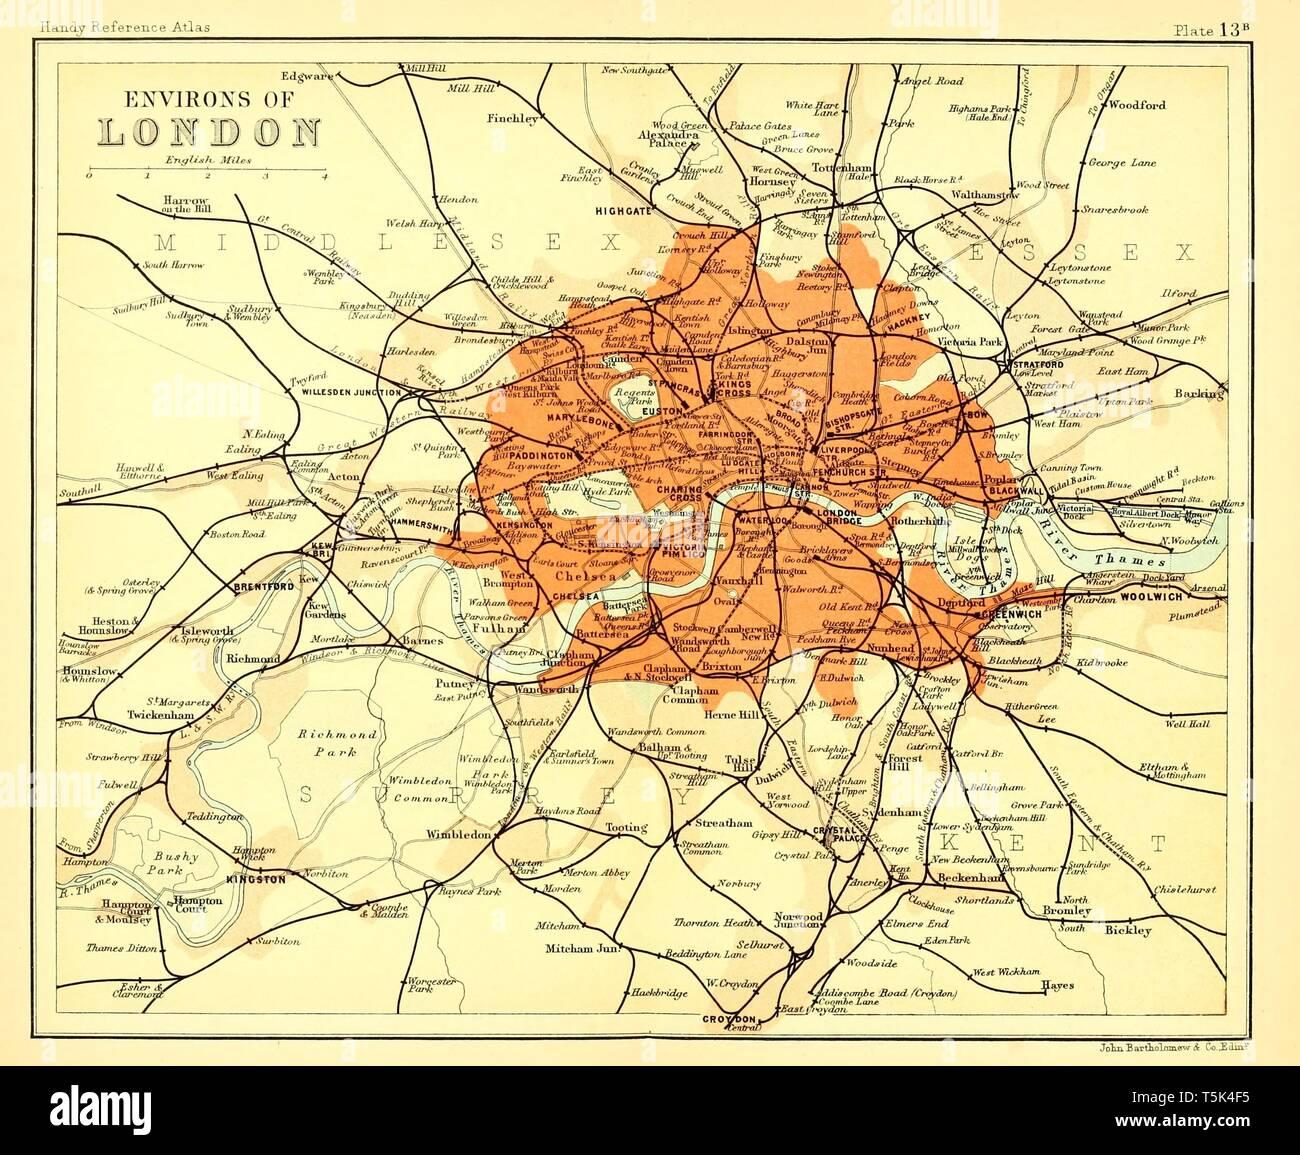 London City Innere Stadt Themse Lithographie 1892 alter historischer Stadtplan